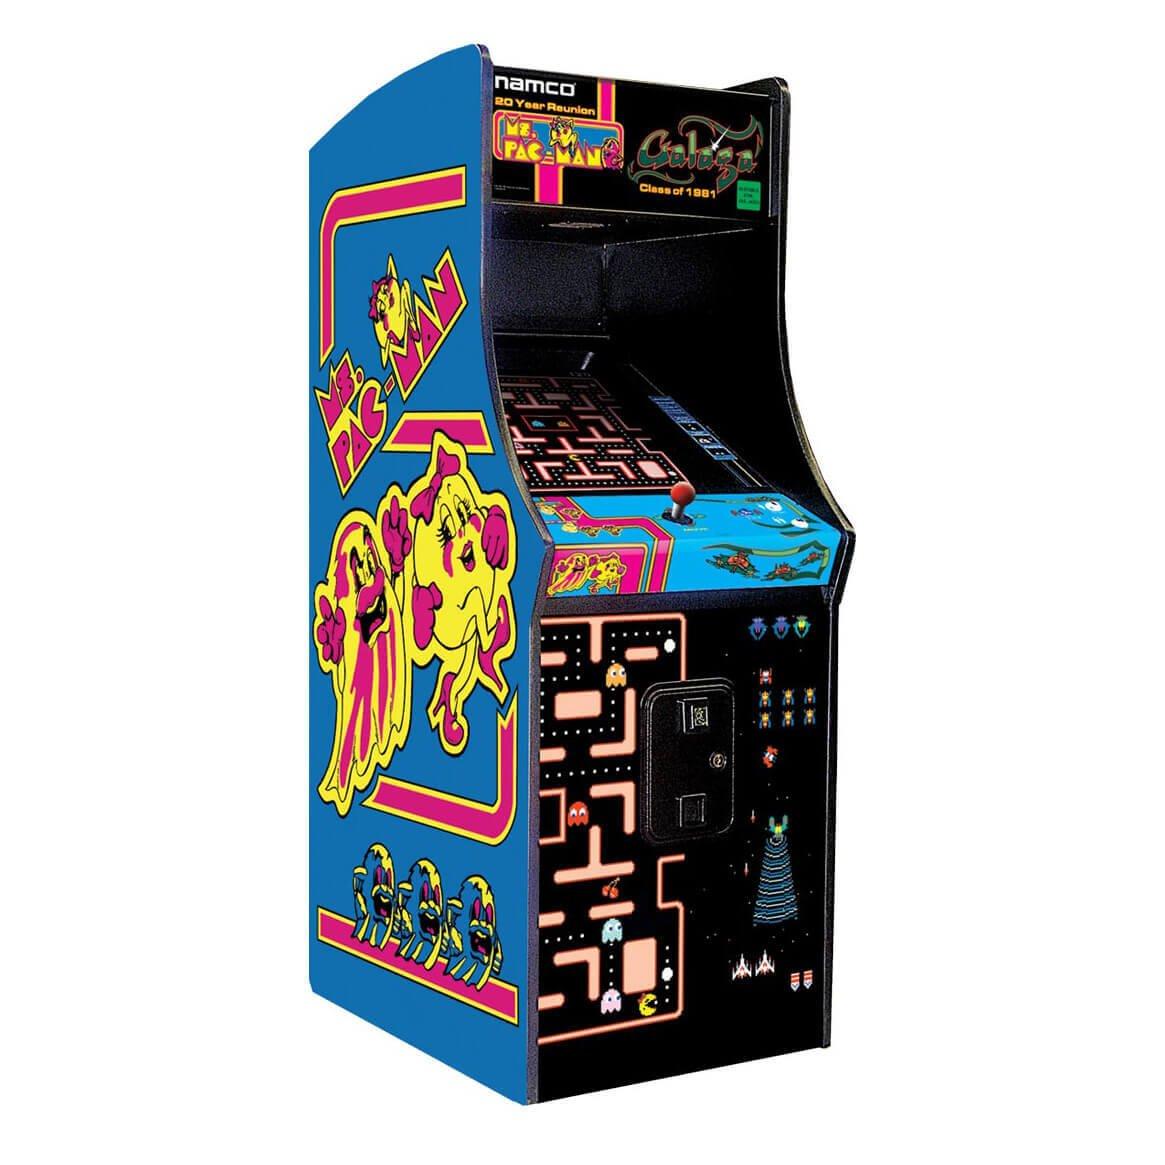 Ms-Pacman-Galaga-Left